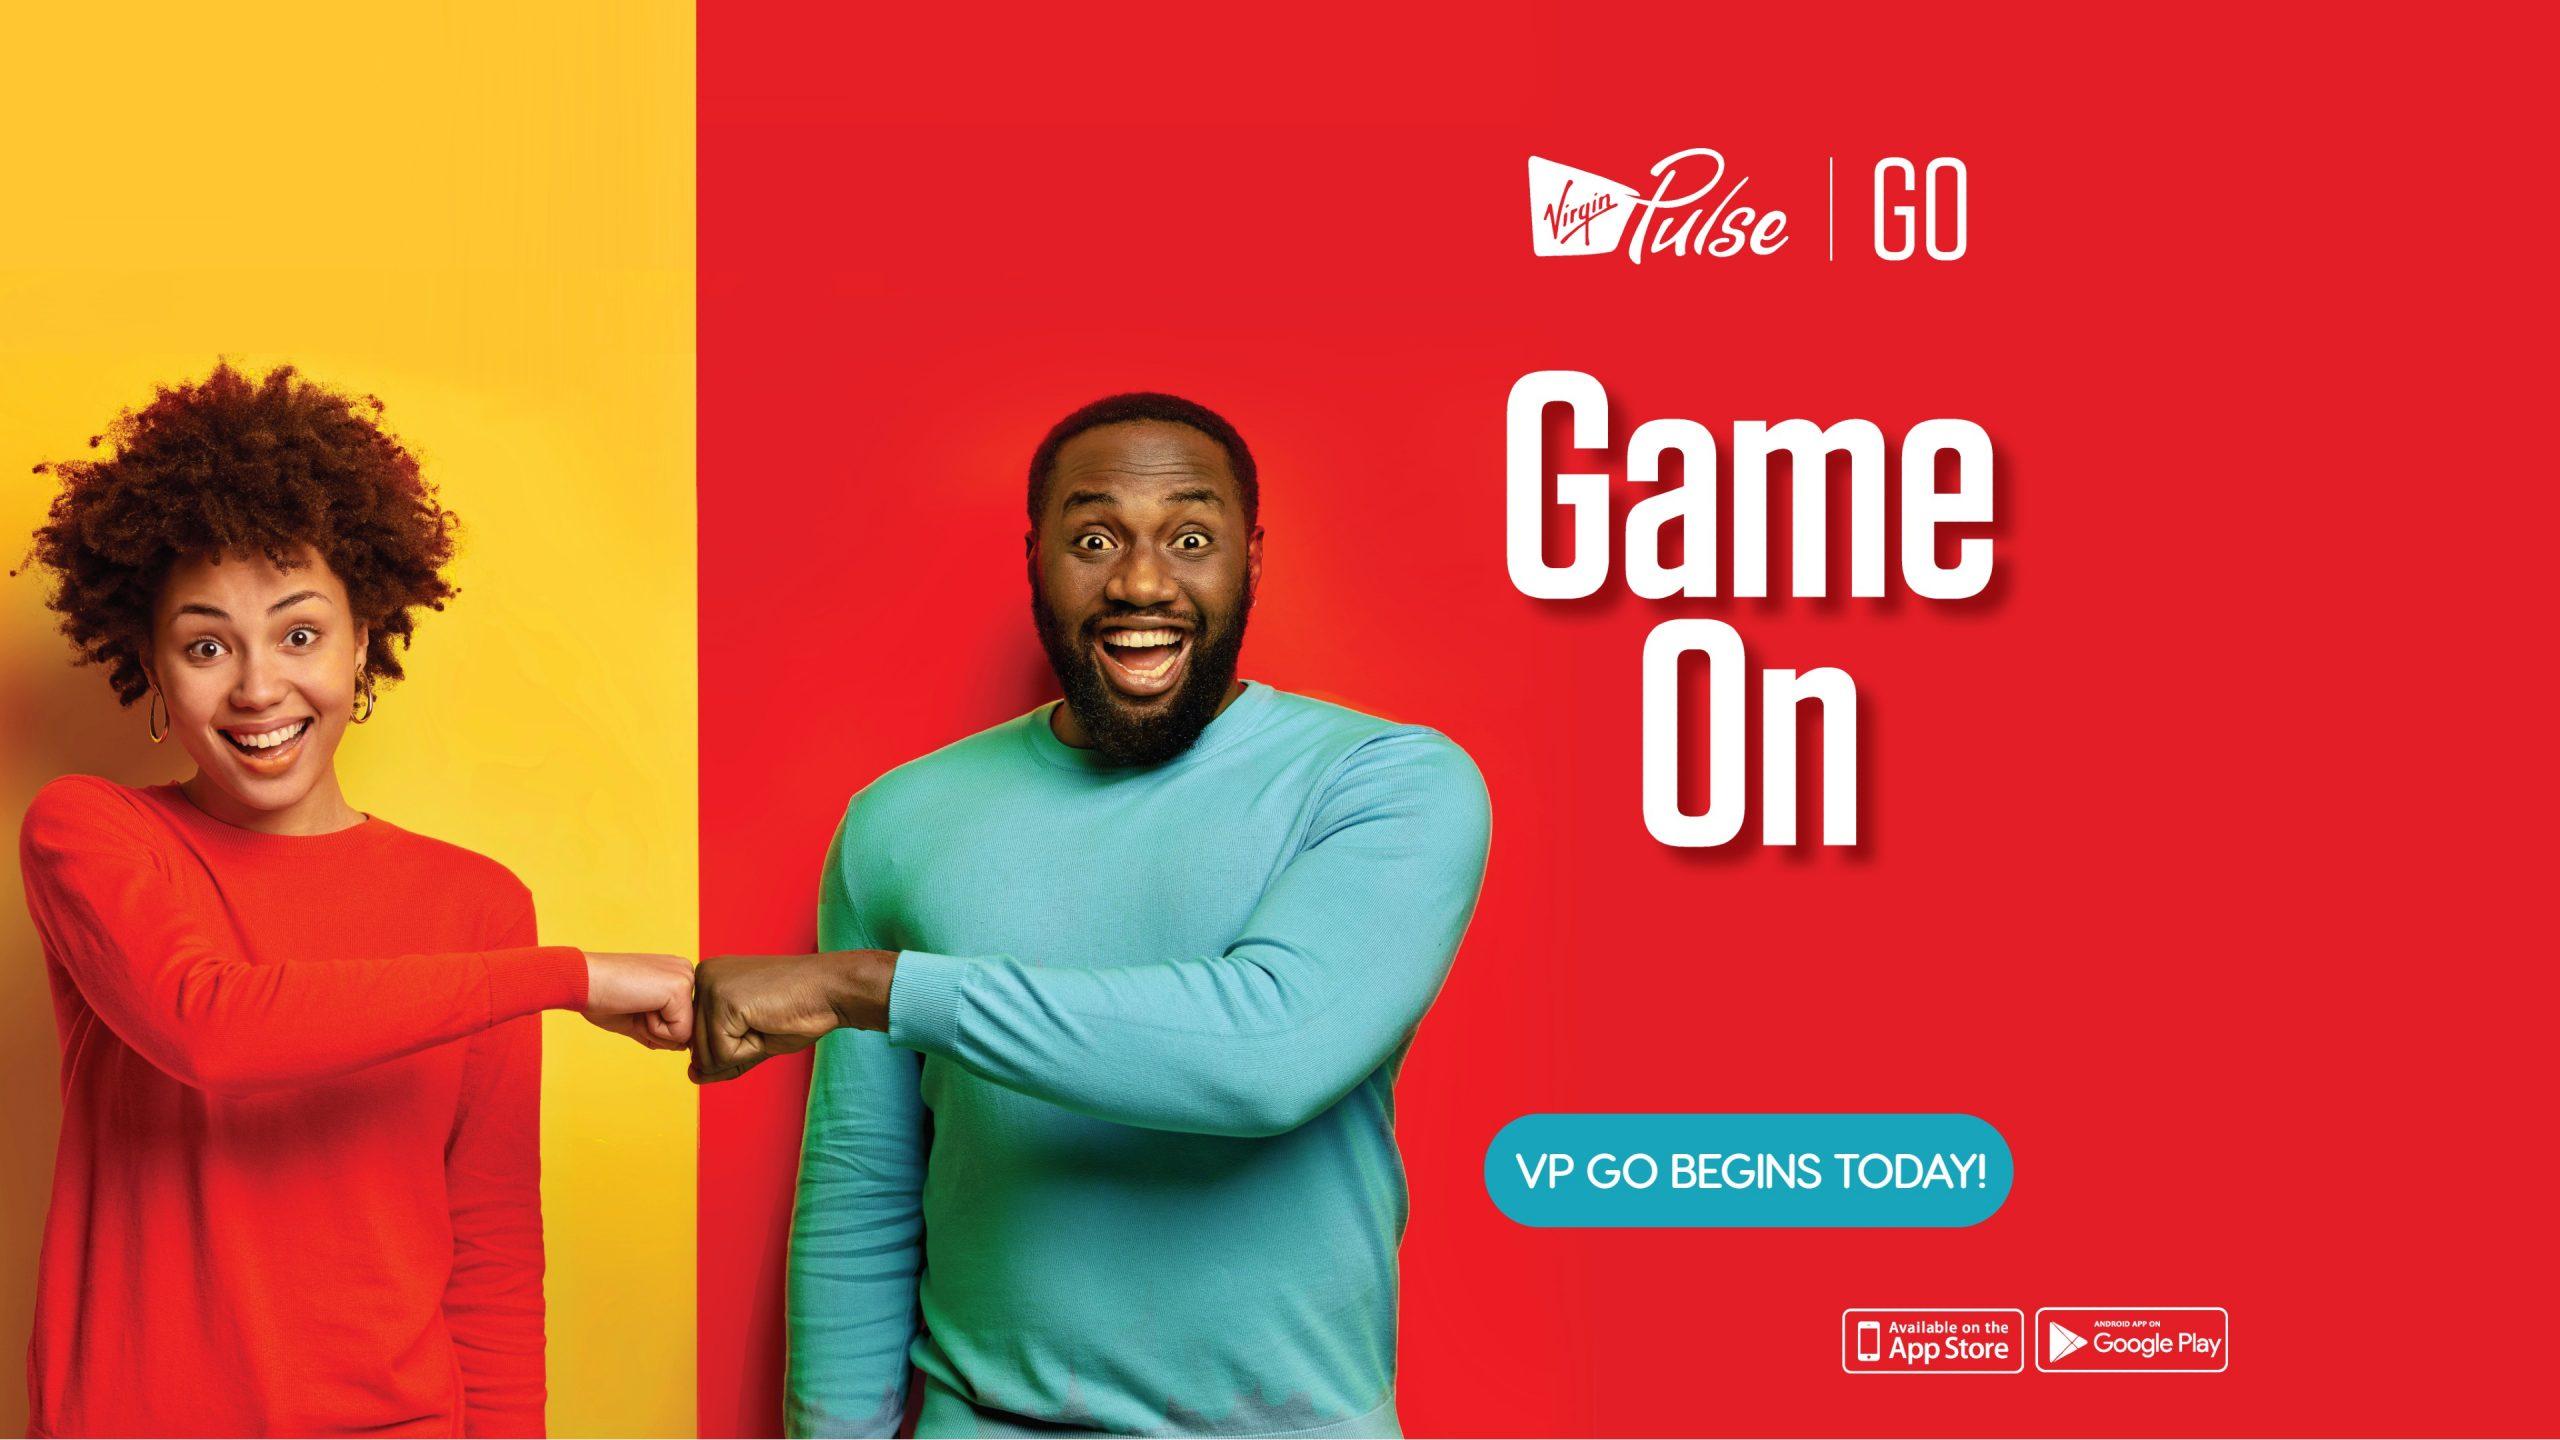 Virgin Pulse Destination GO Challenge